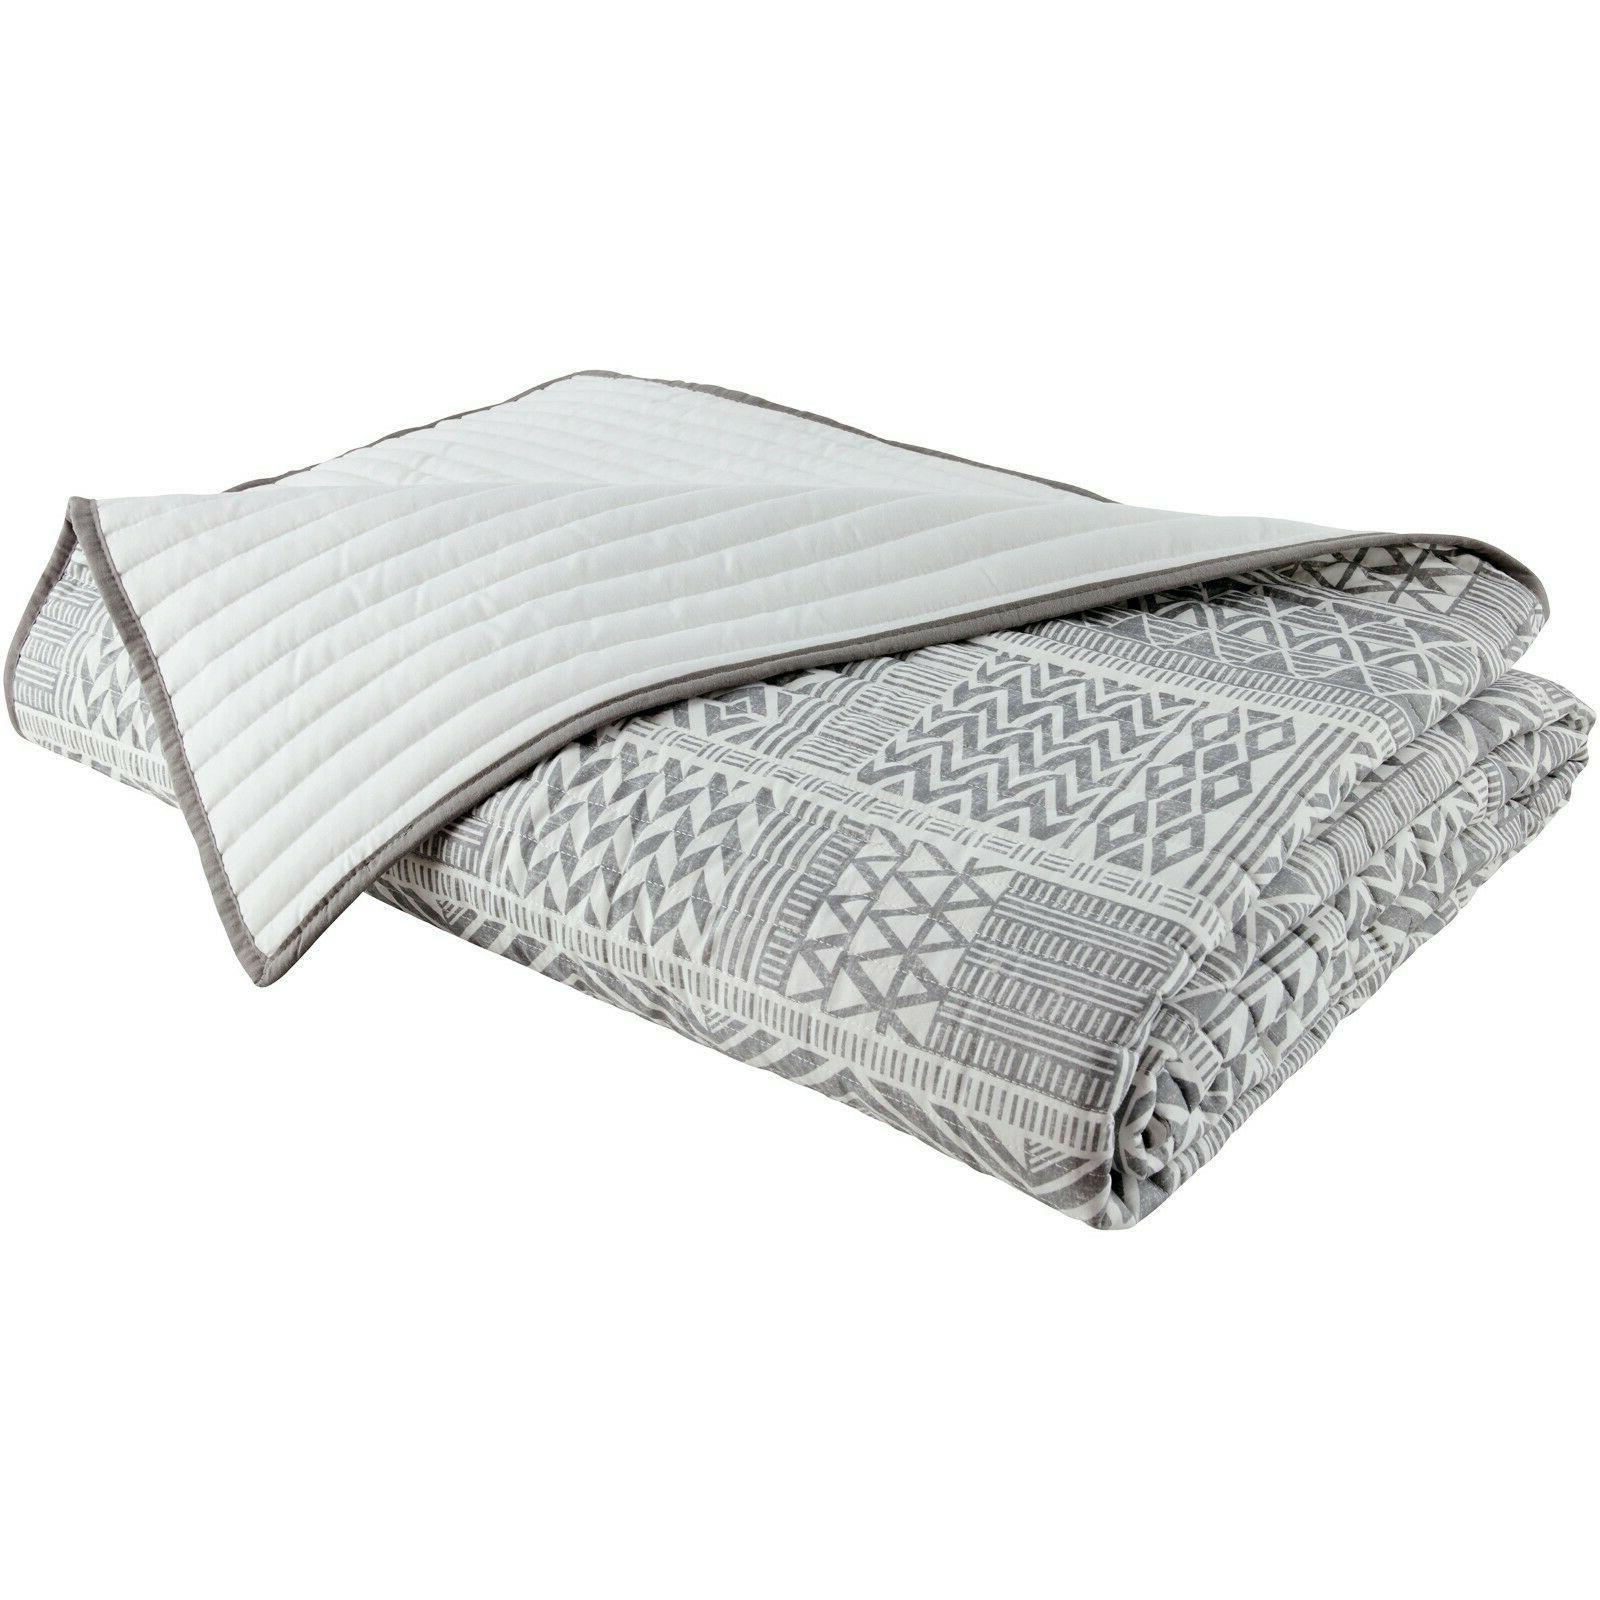 Quilt Set 3 Pc Microfiber Grey White Geometric Soft Warm